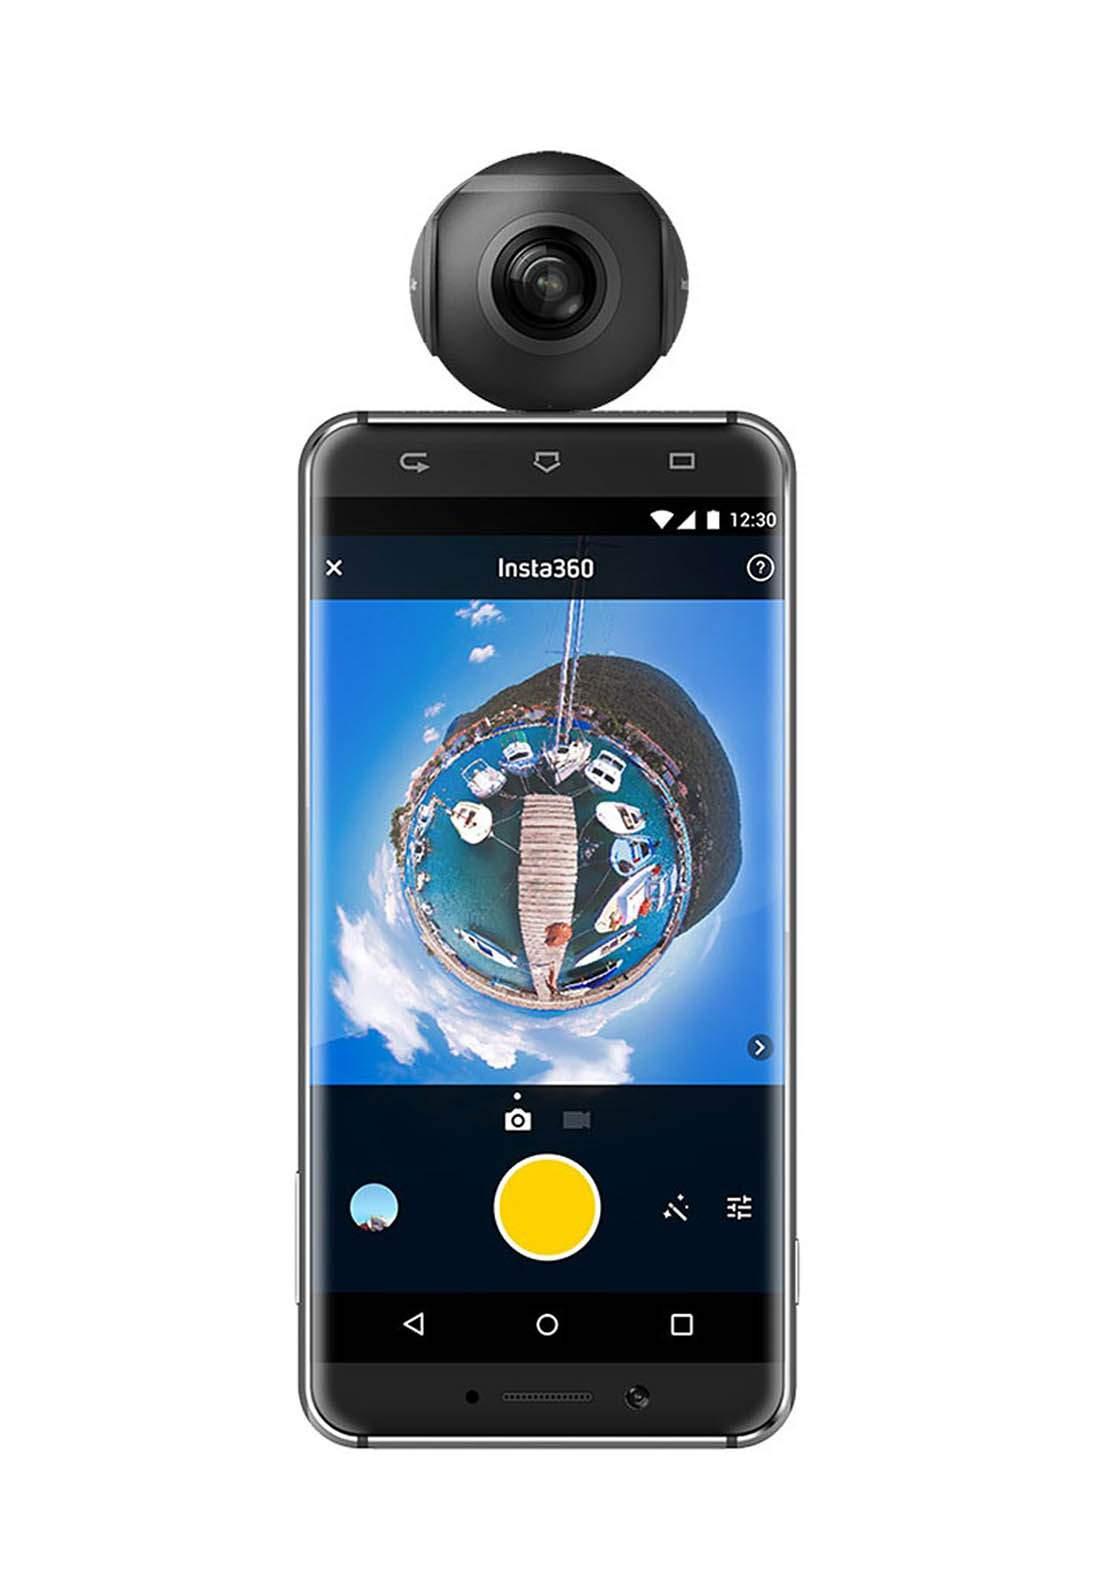 Insta360 Camera for Android Phone - Black عدسة كاميرا للهاتف